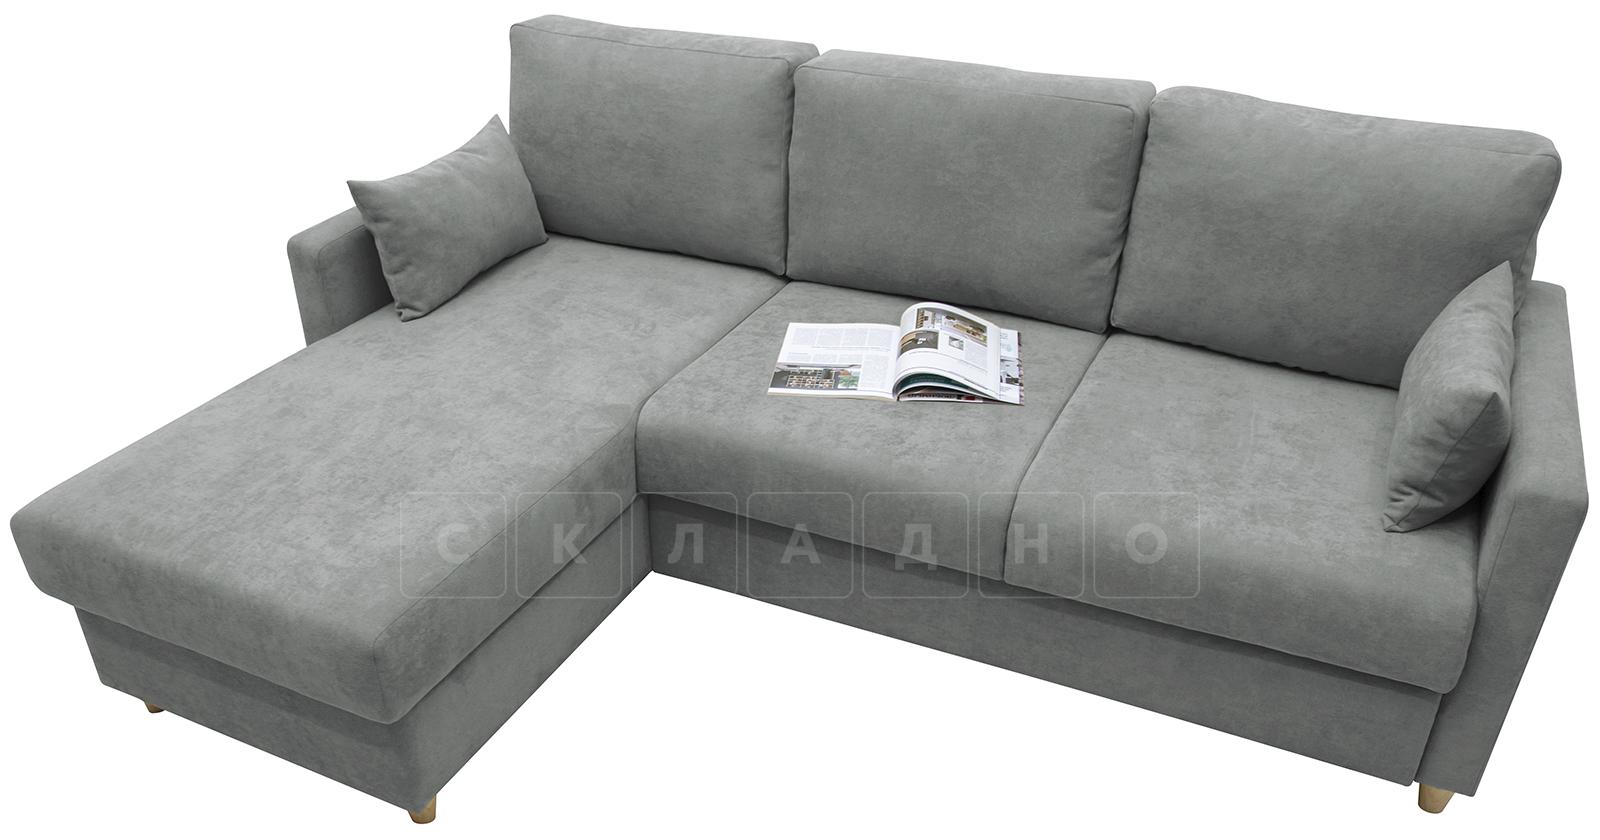 Угловой диван Дарвин серый фото 3 | интернет-магазин Складно